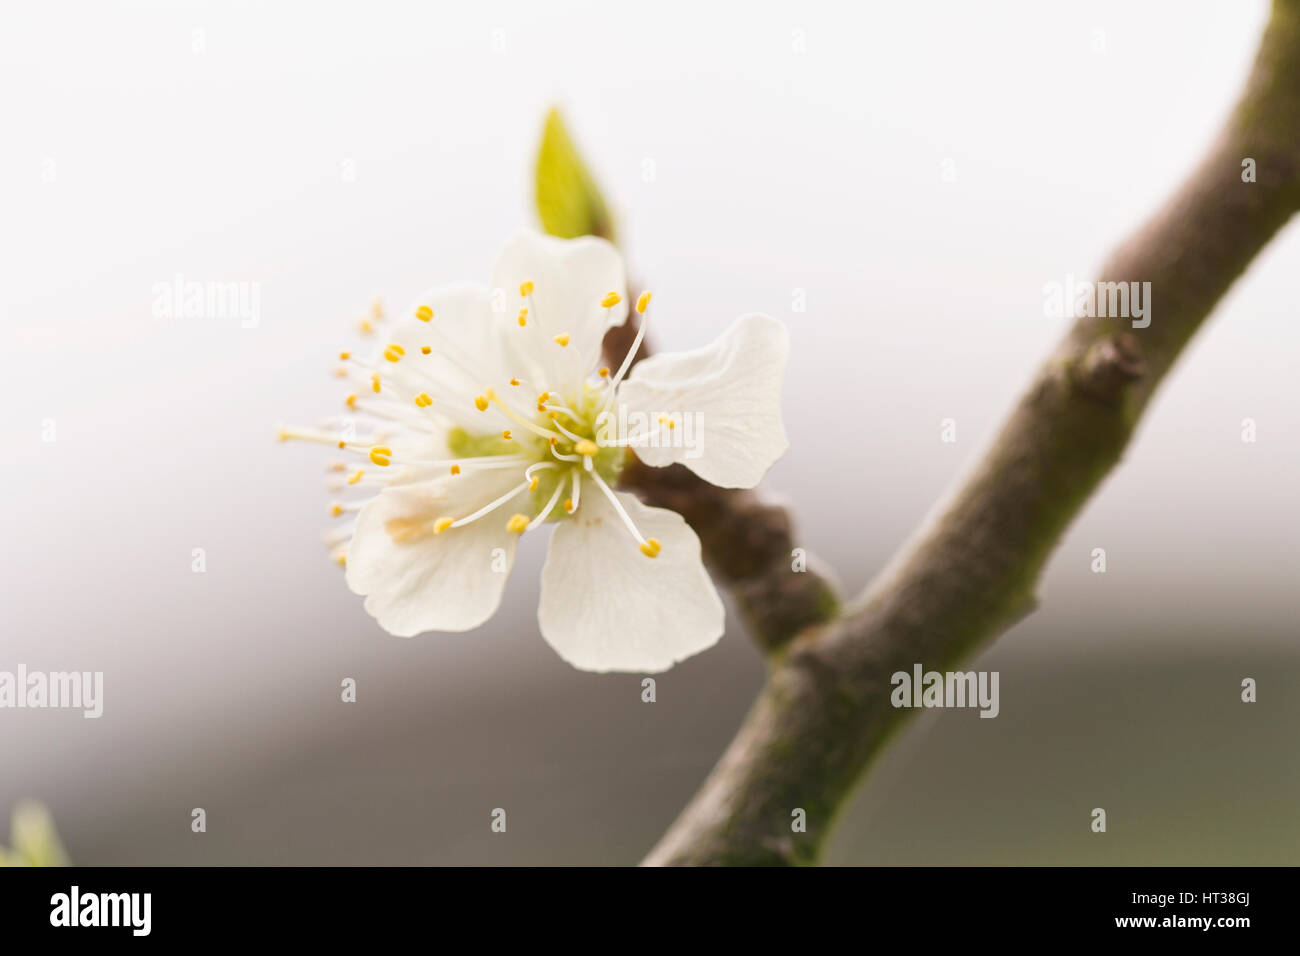 Plum tree flower - Stock Image